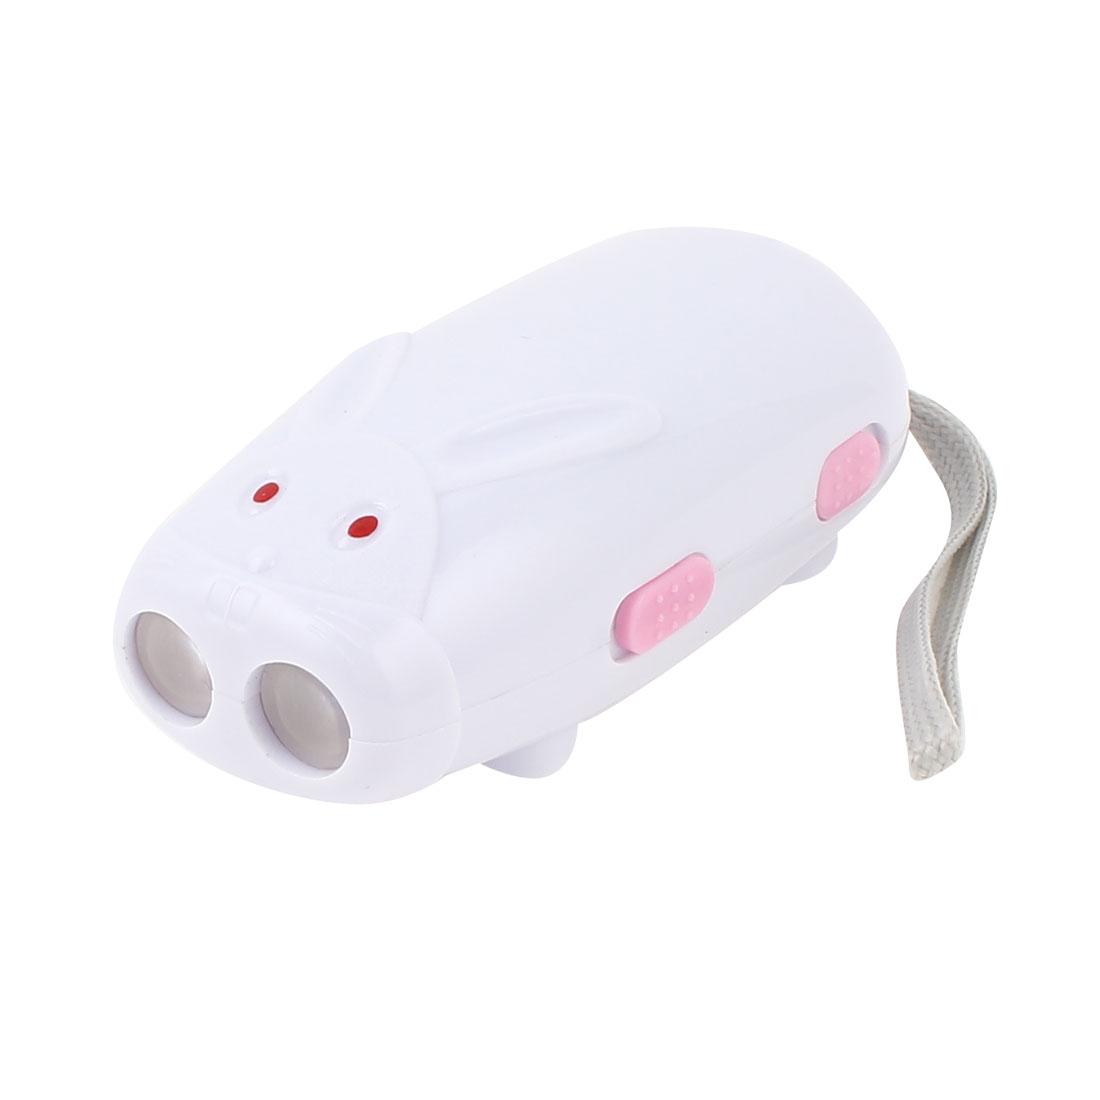 Rabbit Deisgn 2 LED Flashlight Hand Press Wind Crank No Battery Torch White